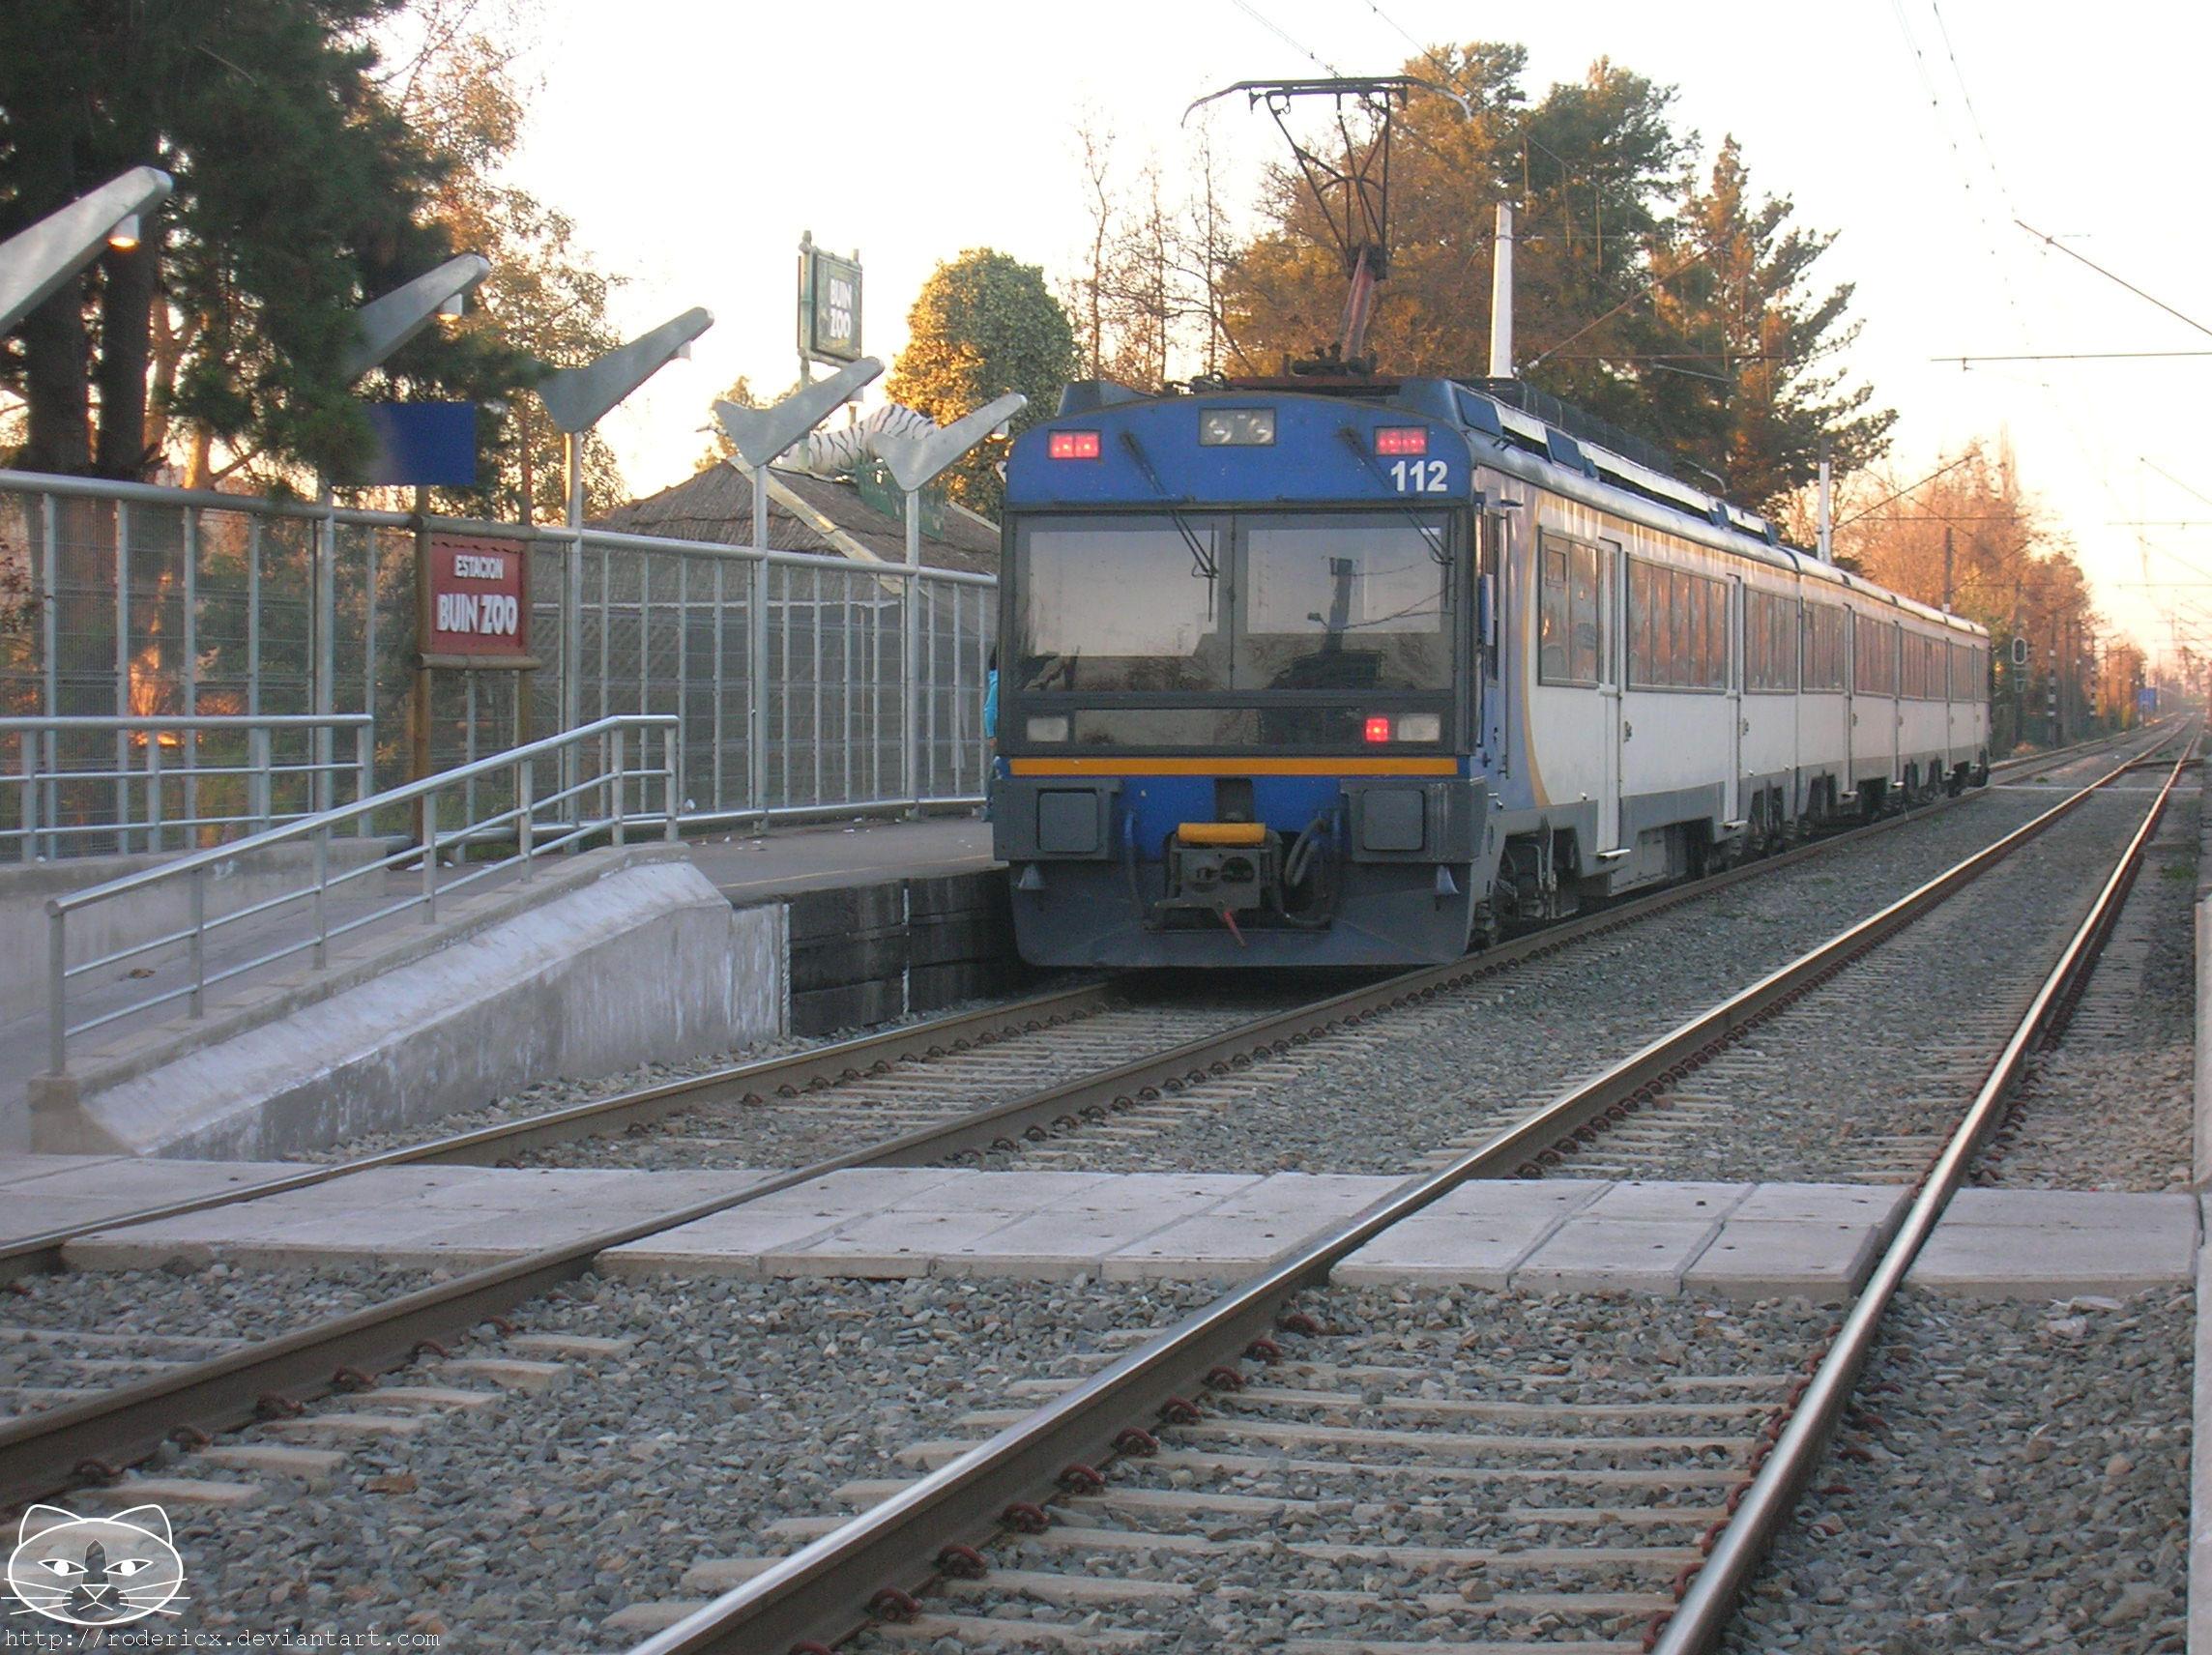 estacion de trenes de buin 5 by rodericx